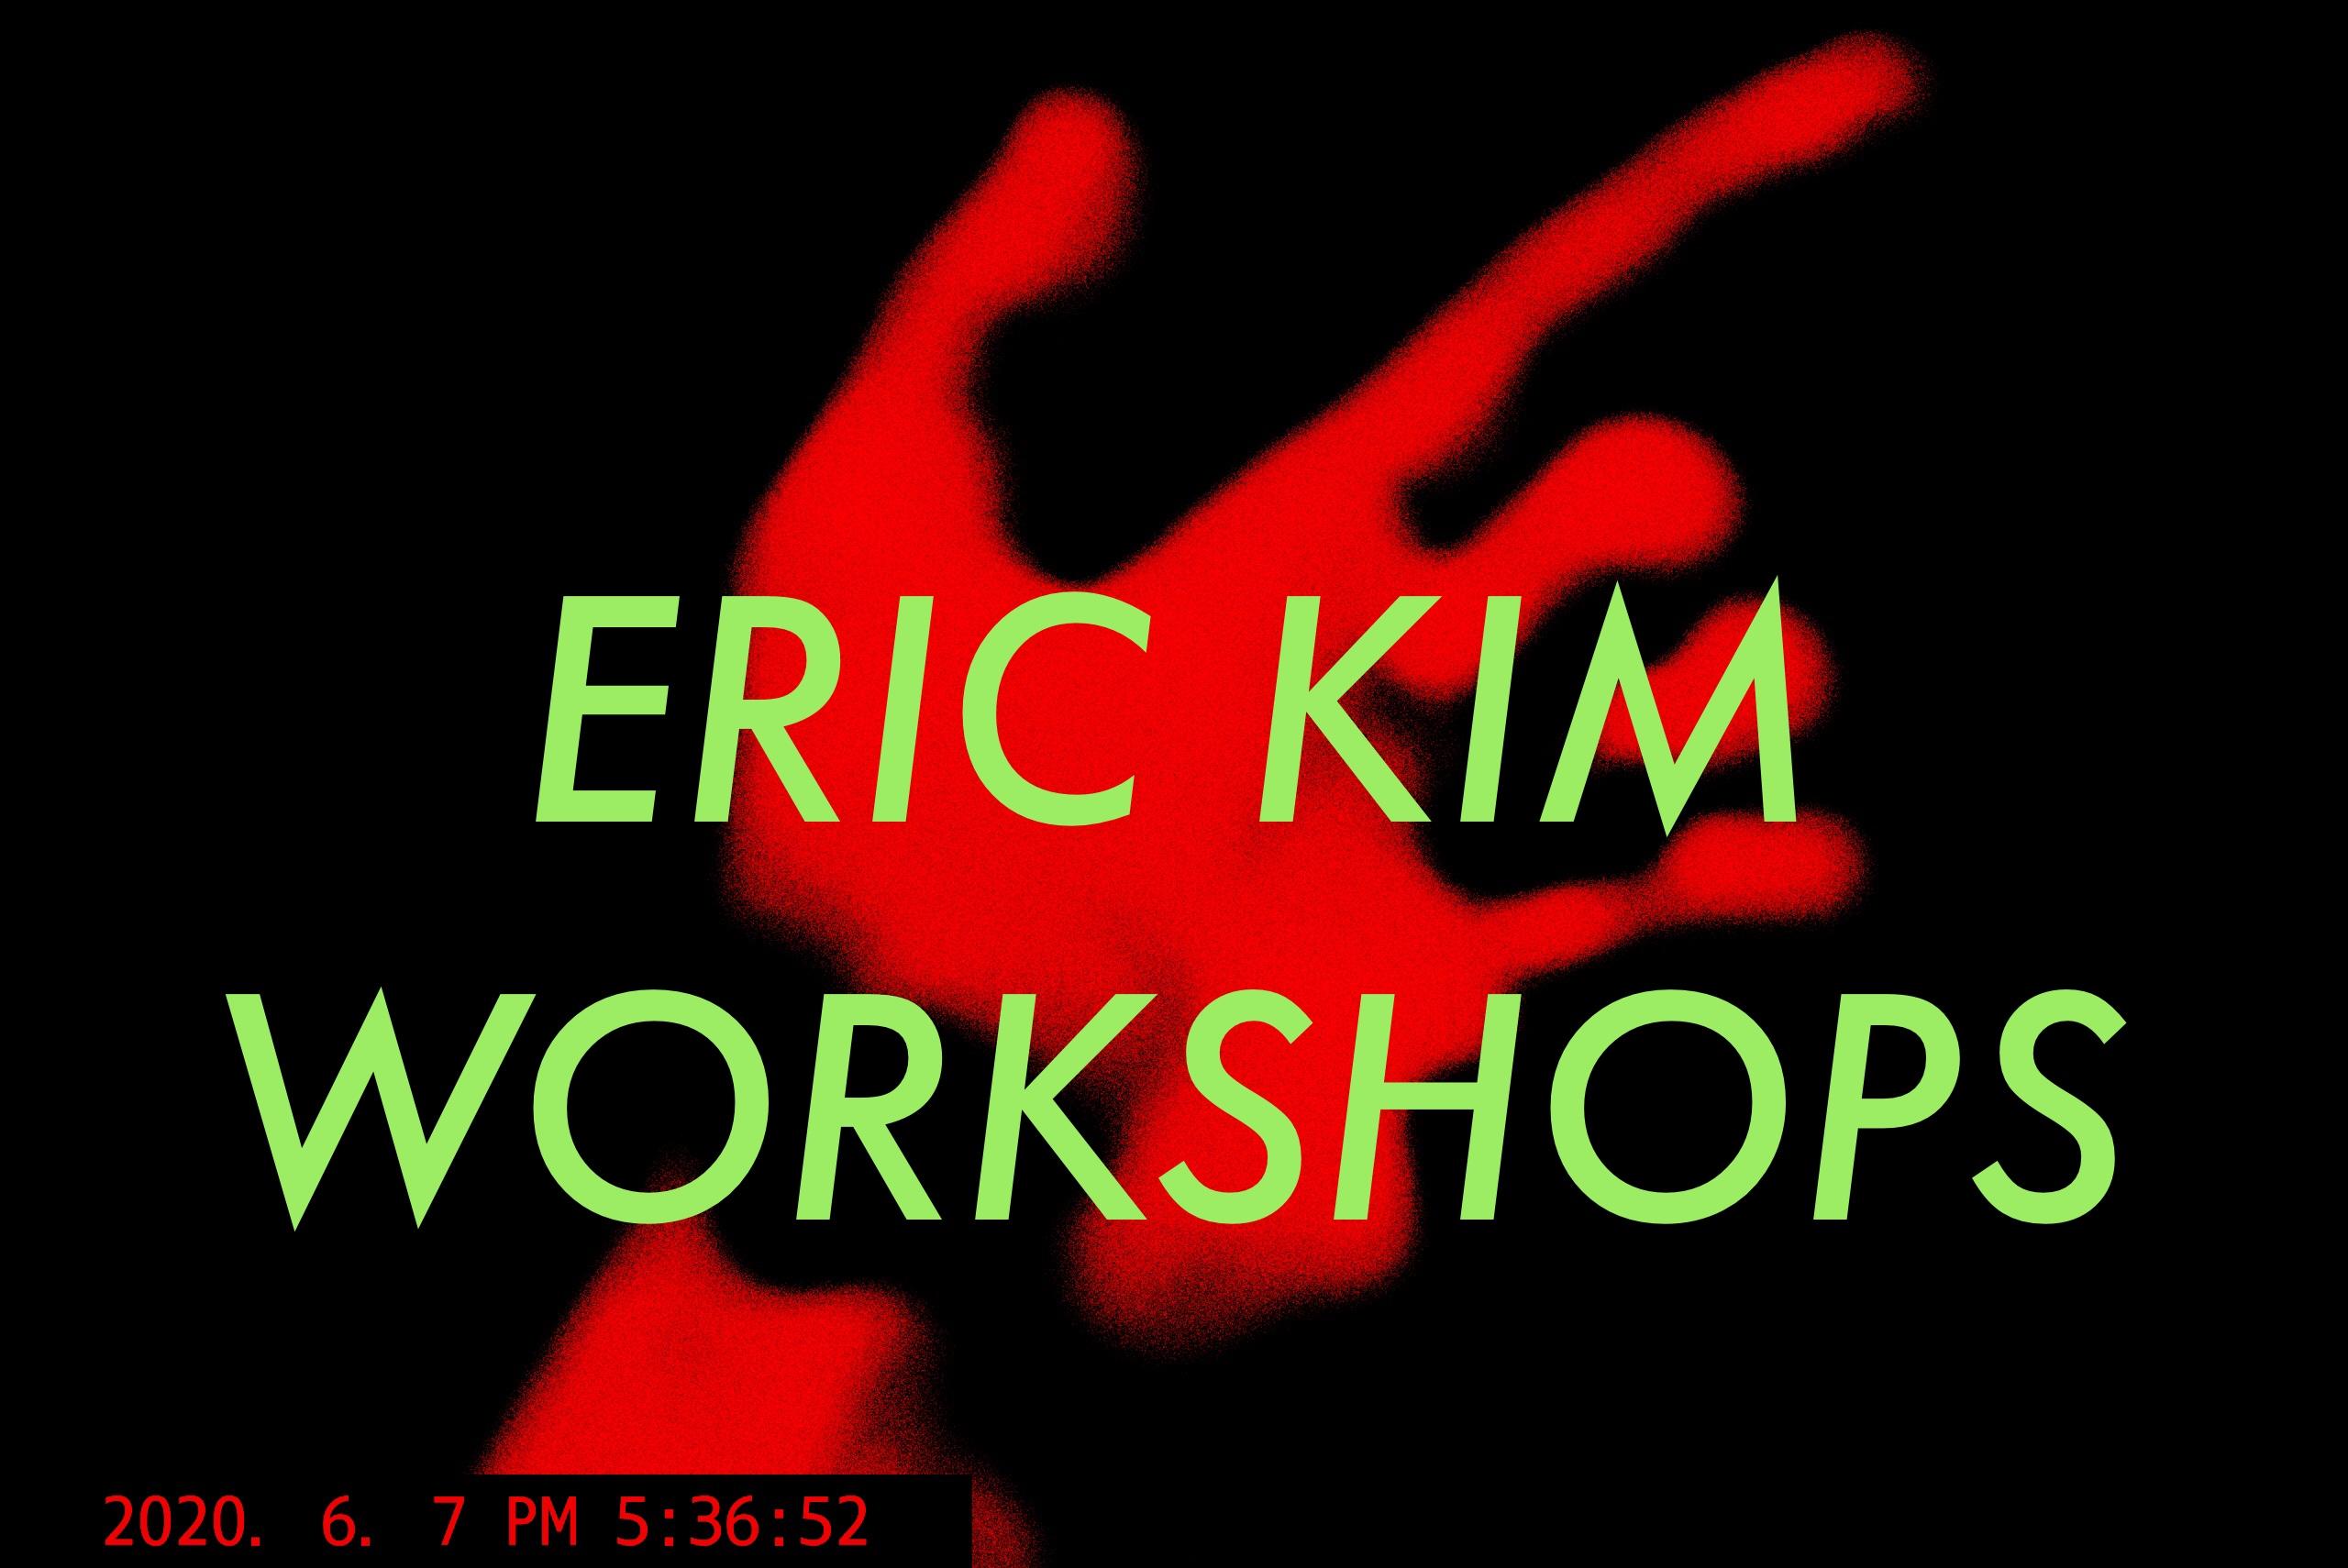 ERIC KIM workshops red hand